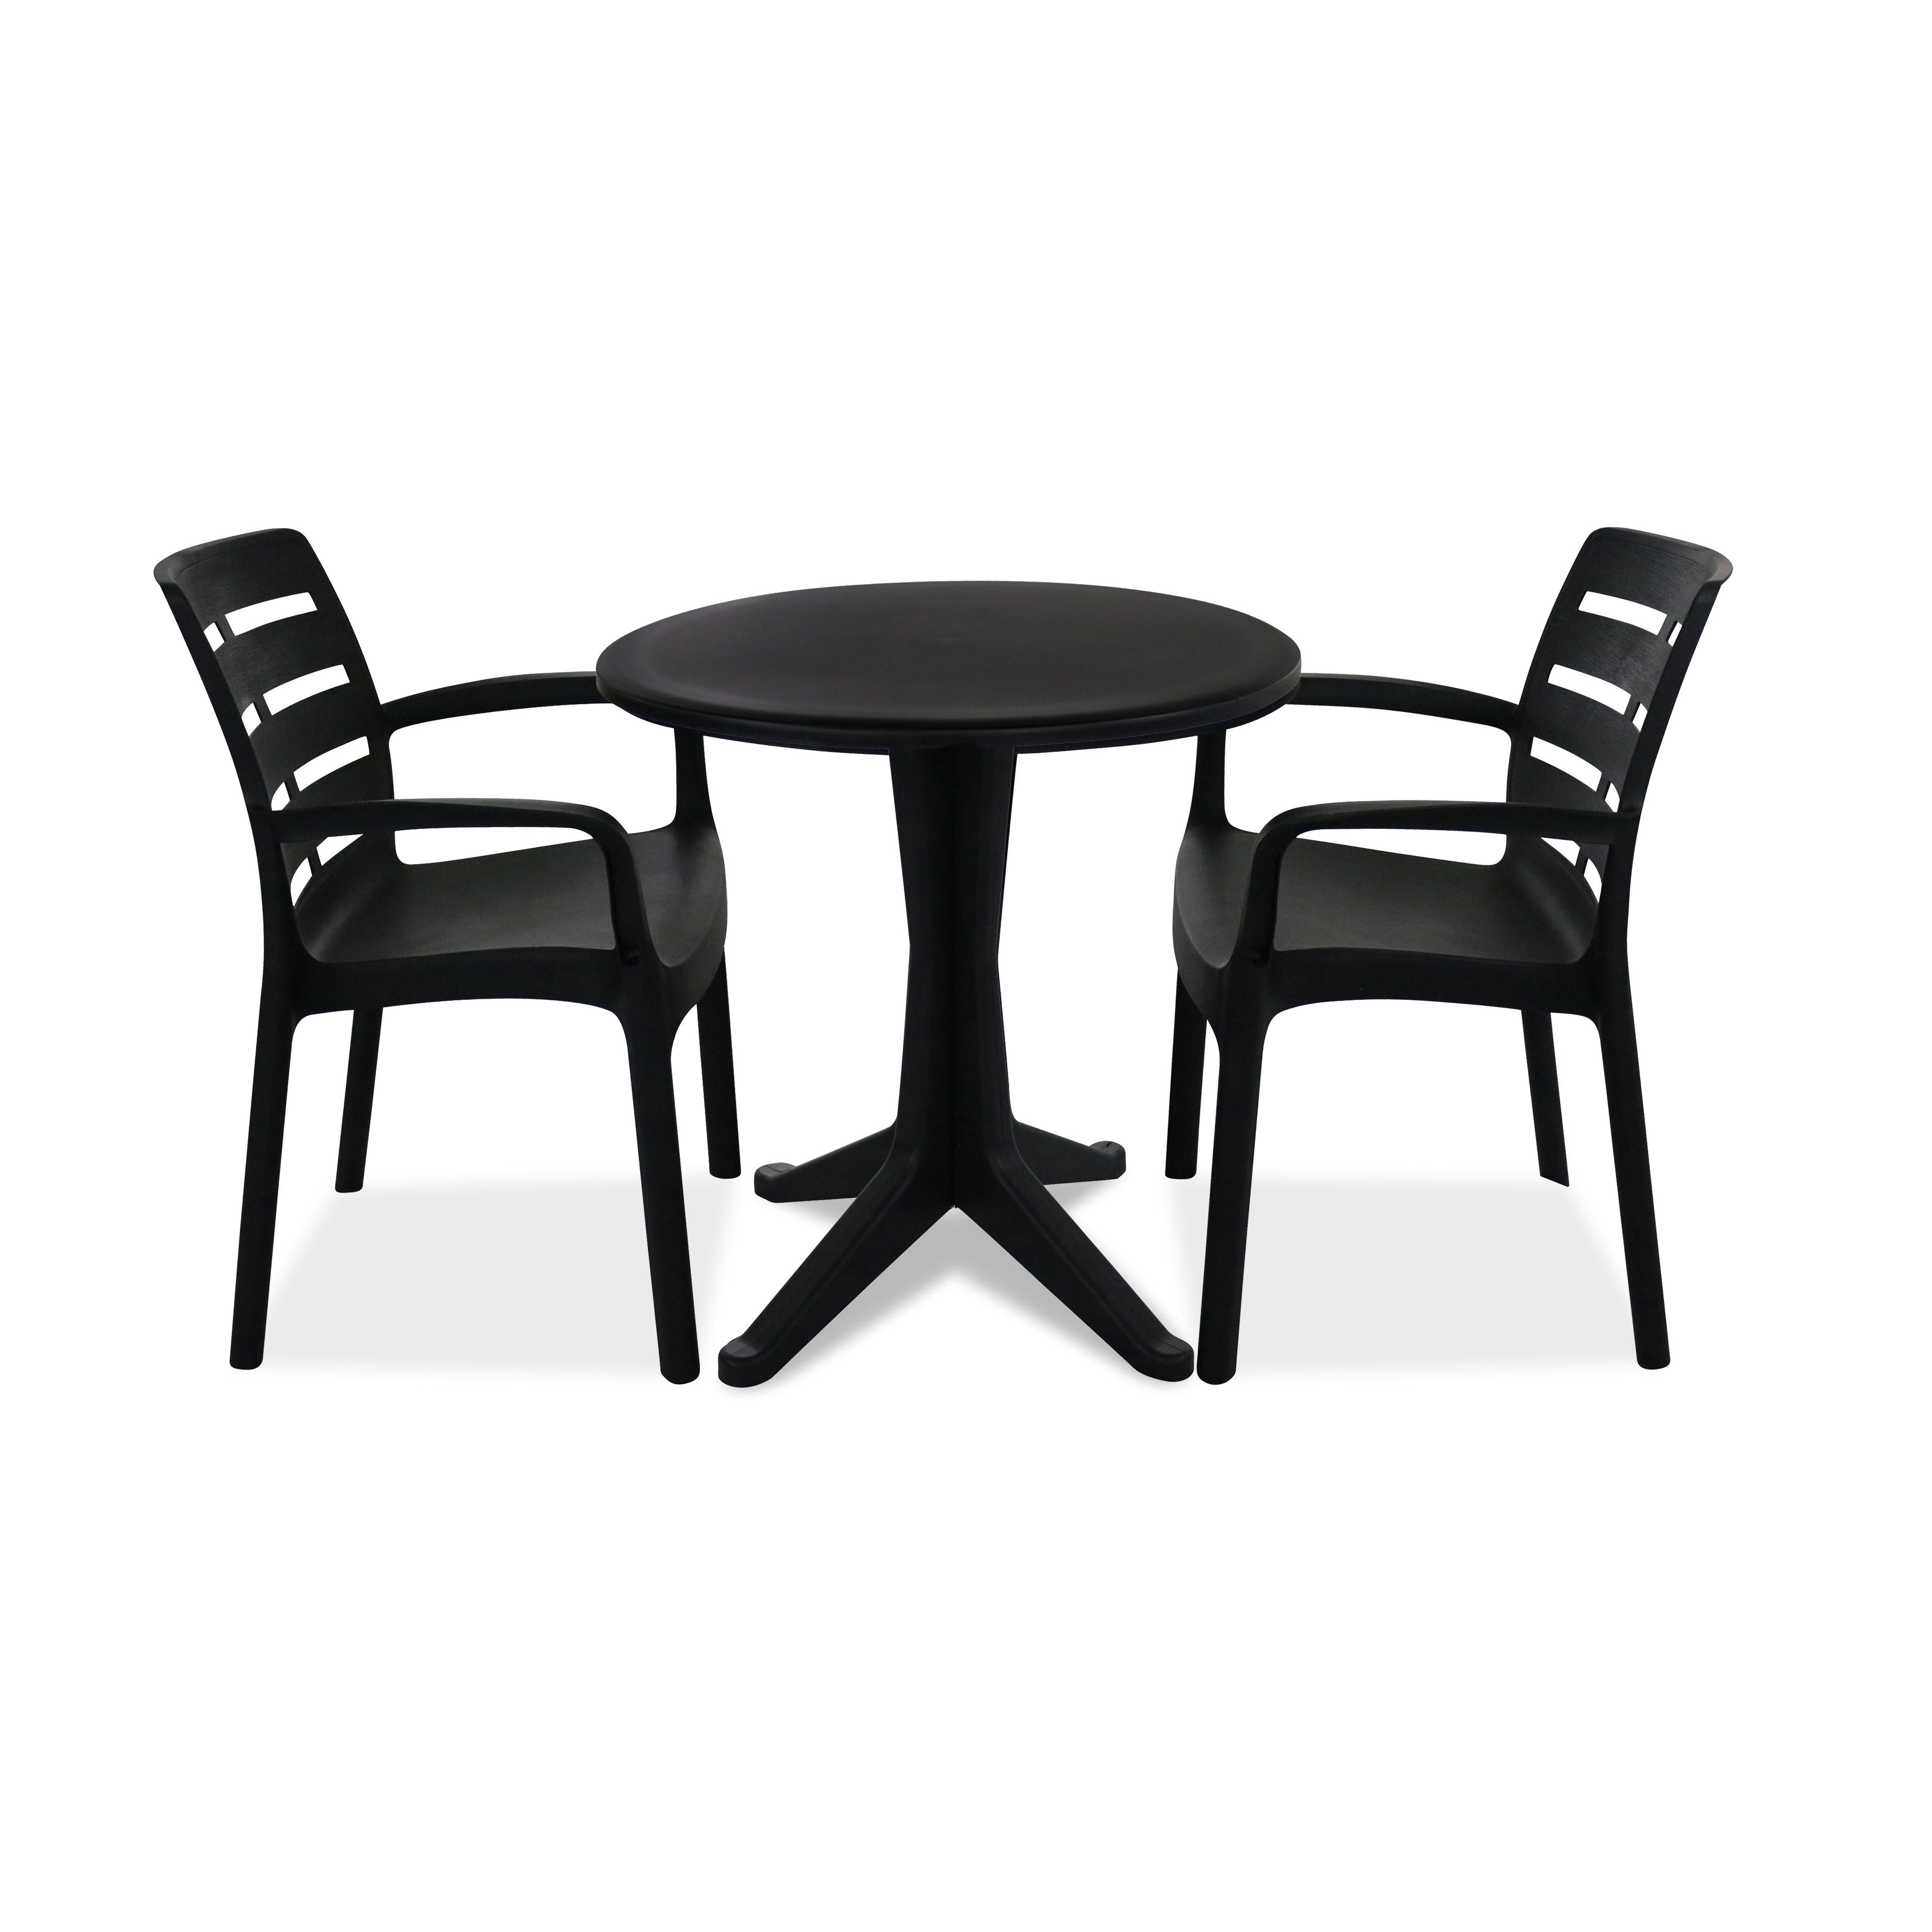 table de jardin ronde en plastique fauteuils. Black Bedroom Furniture Sets. Home Design Ideas